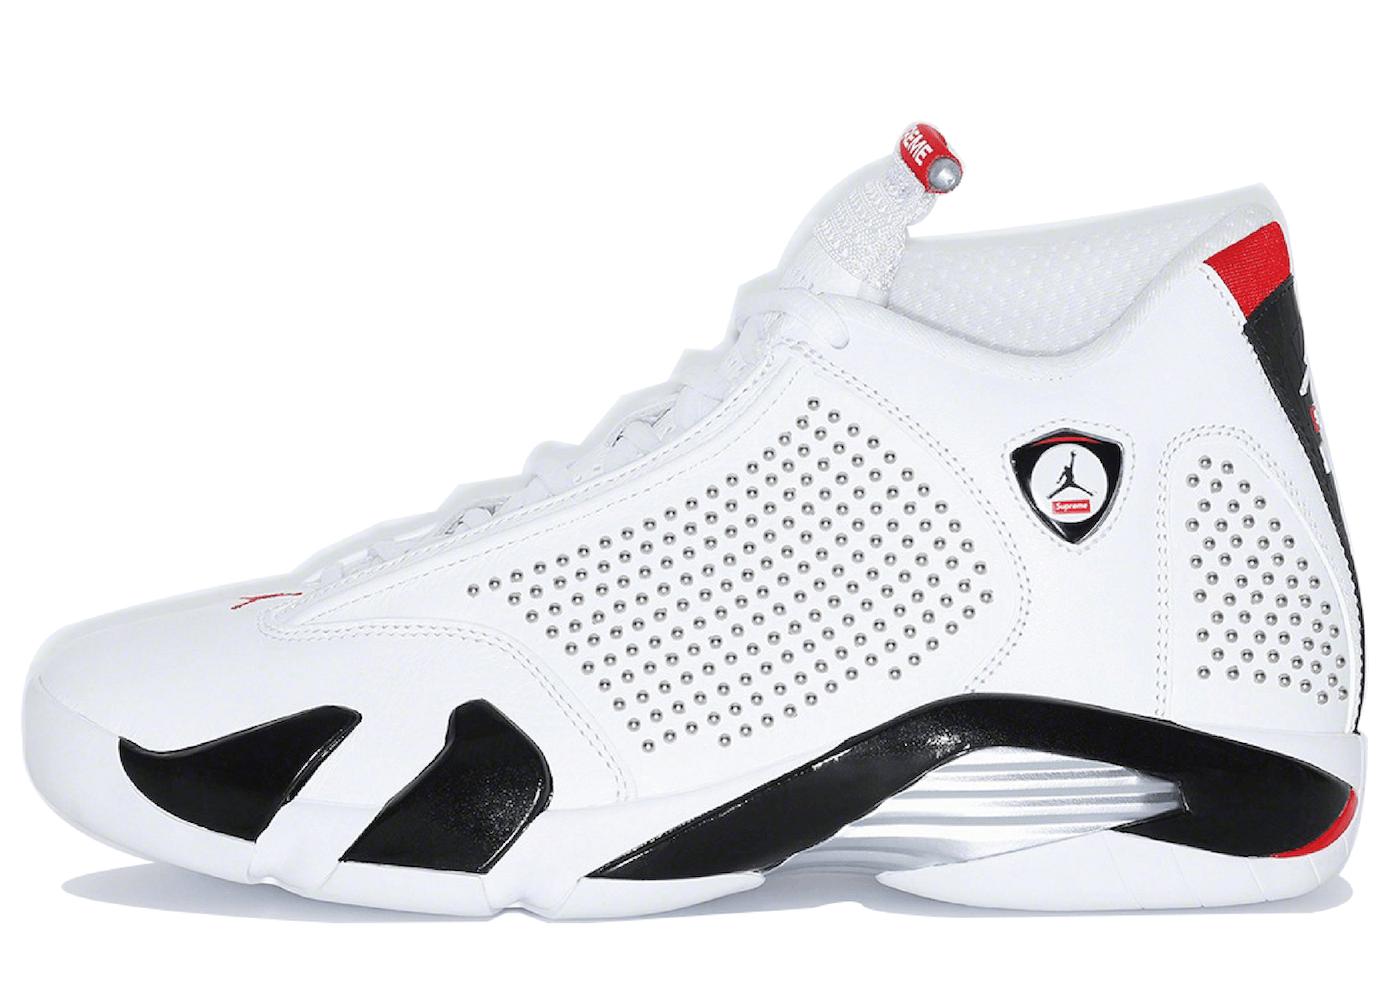 Nike Air Jordan 14 Retro Supreme White